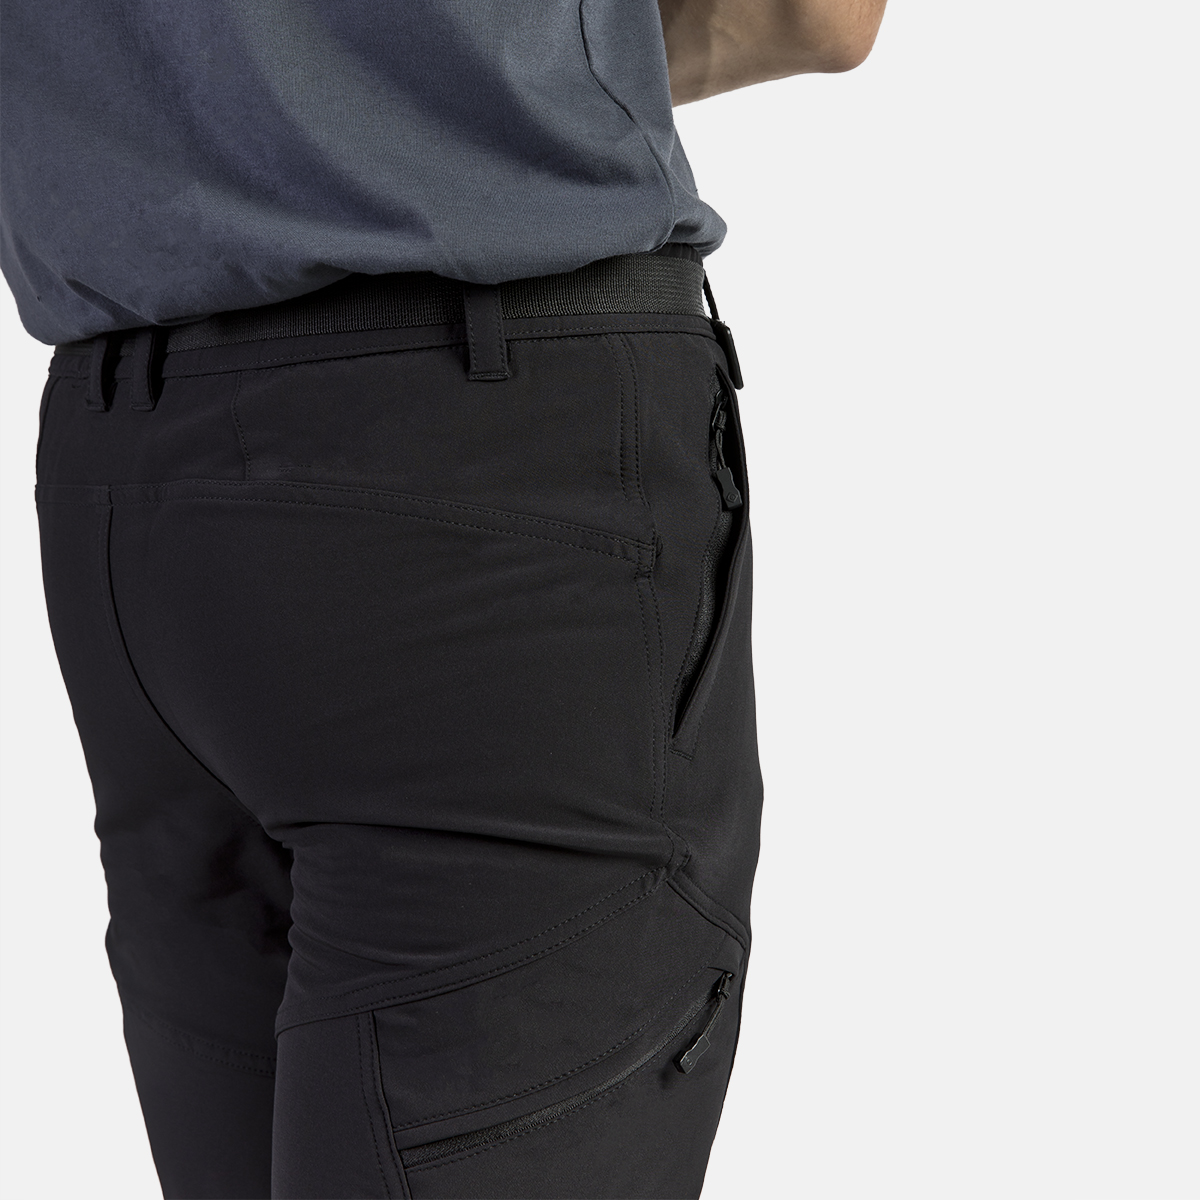 MAN'S BALTIC STRETCH PANT BLACK